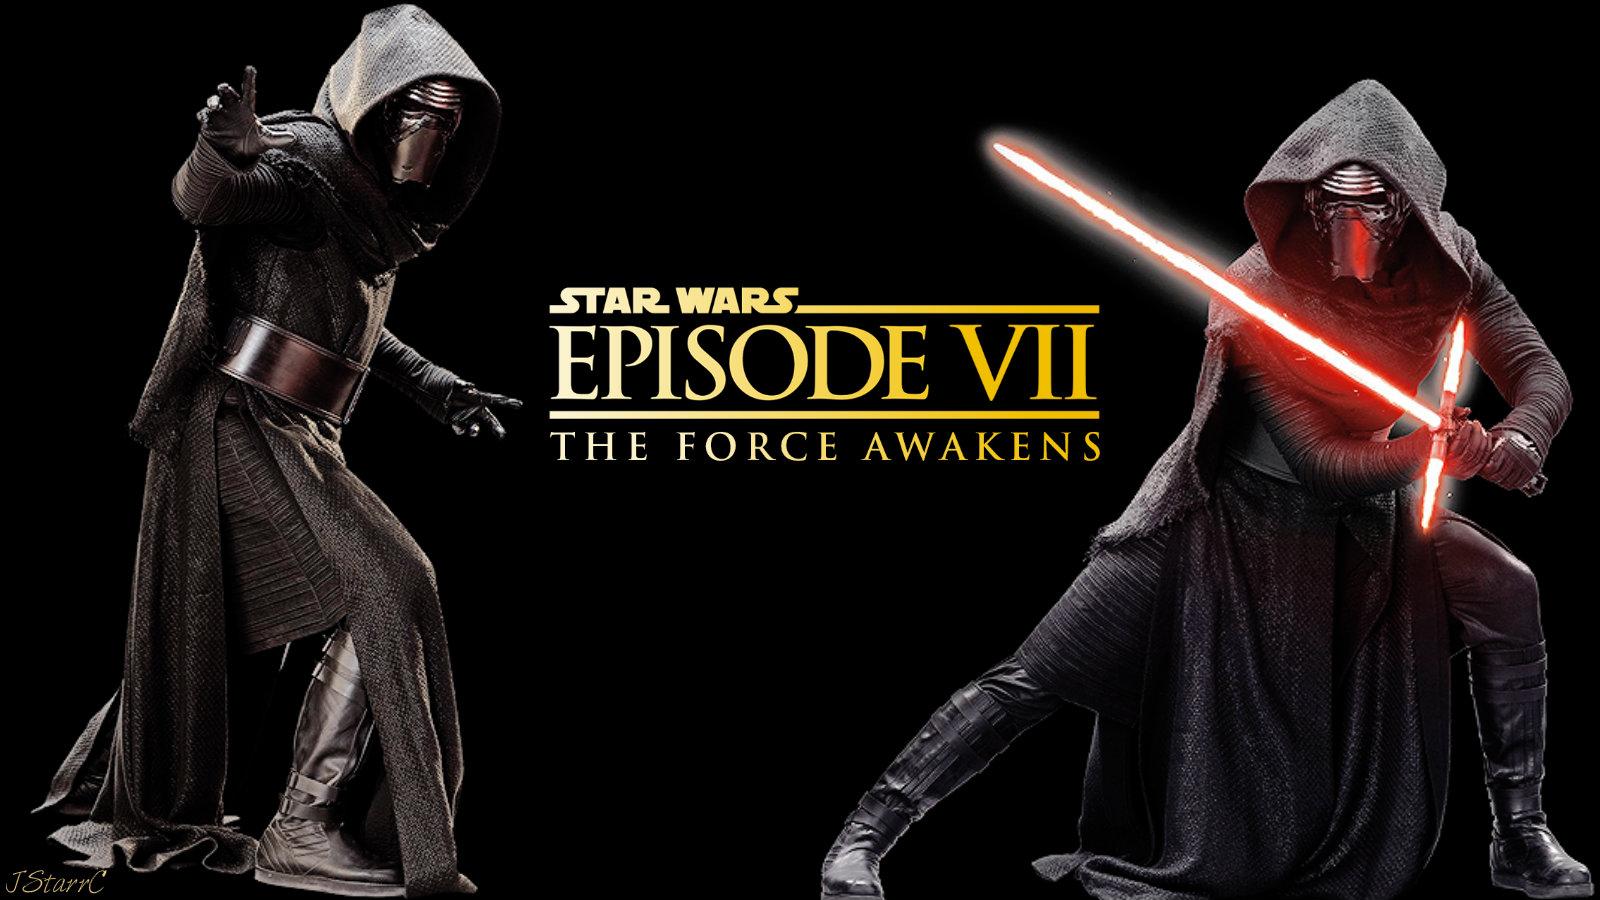 Star Wars Episode Vii The Force Awakens Star Wars Wallpaper